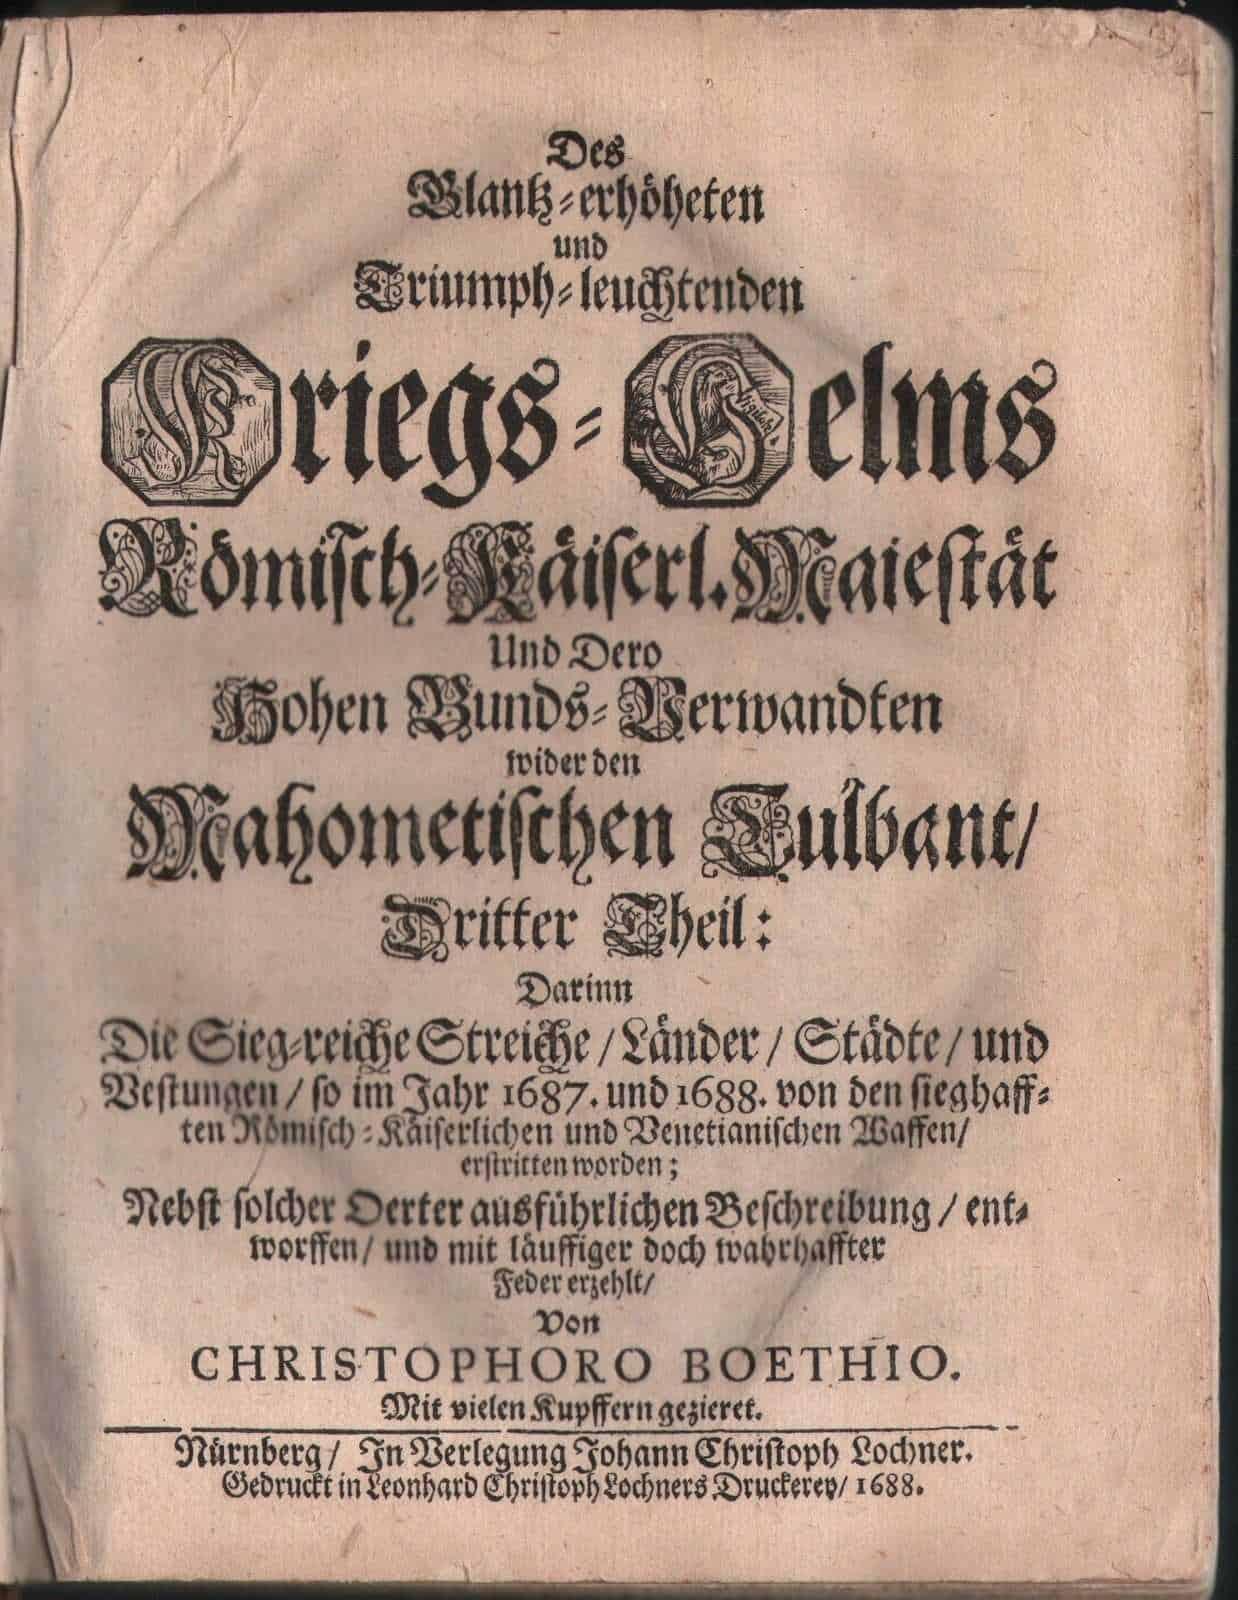 1688-Boethius-TRIUMPH-LEUCHTENDEN-KRIEGS-HELMS-Vol-3-History-Christian-Ottoman-401133054023